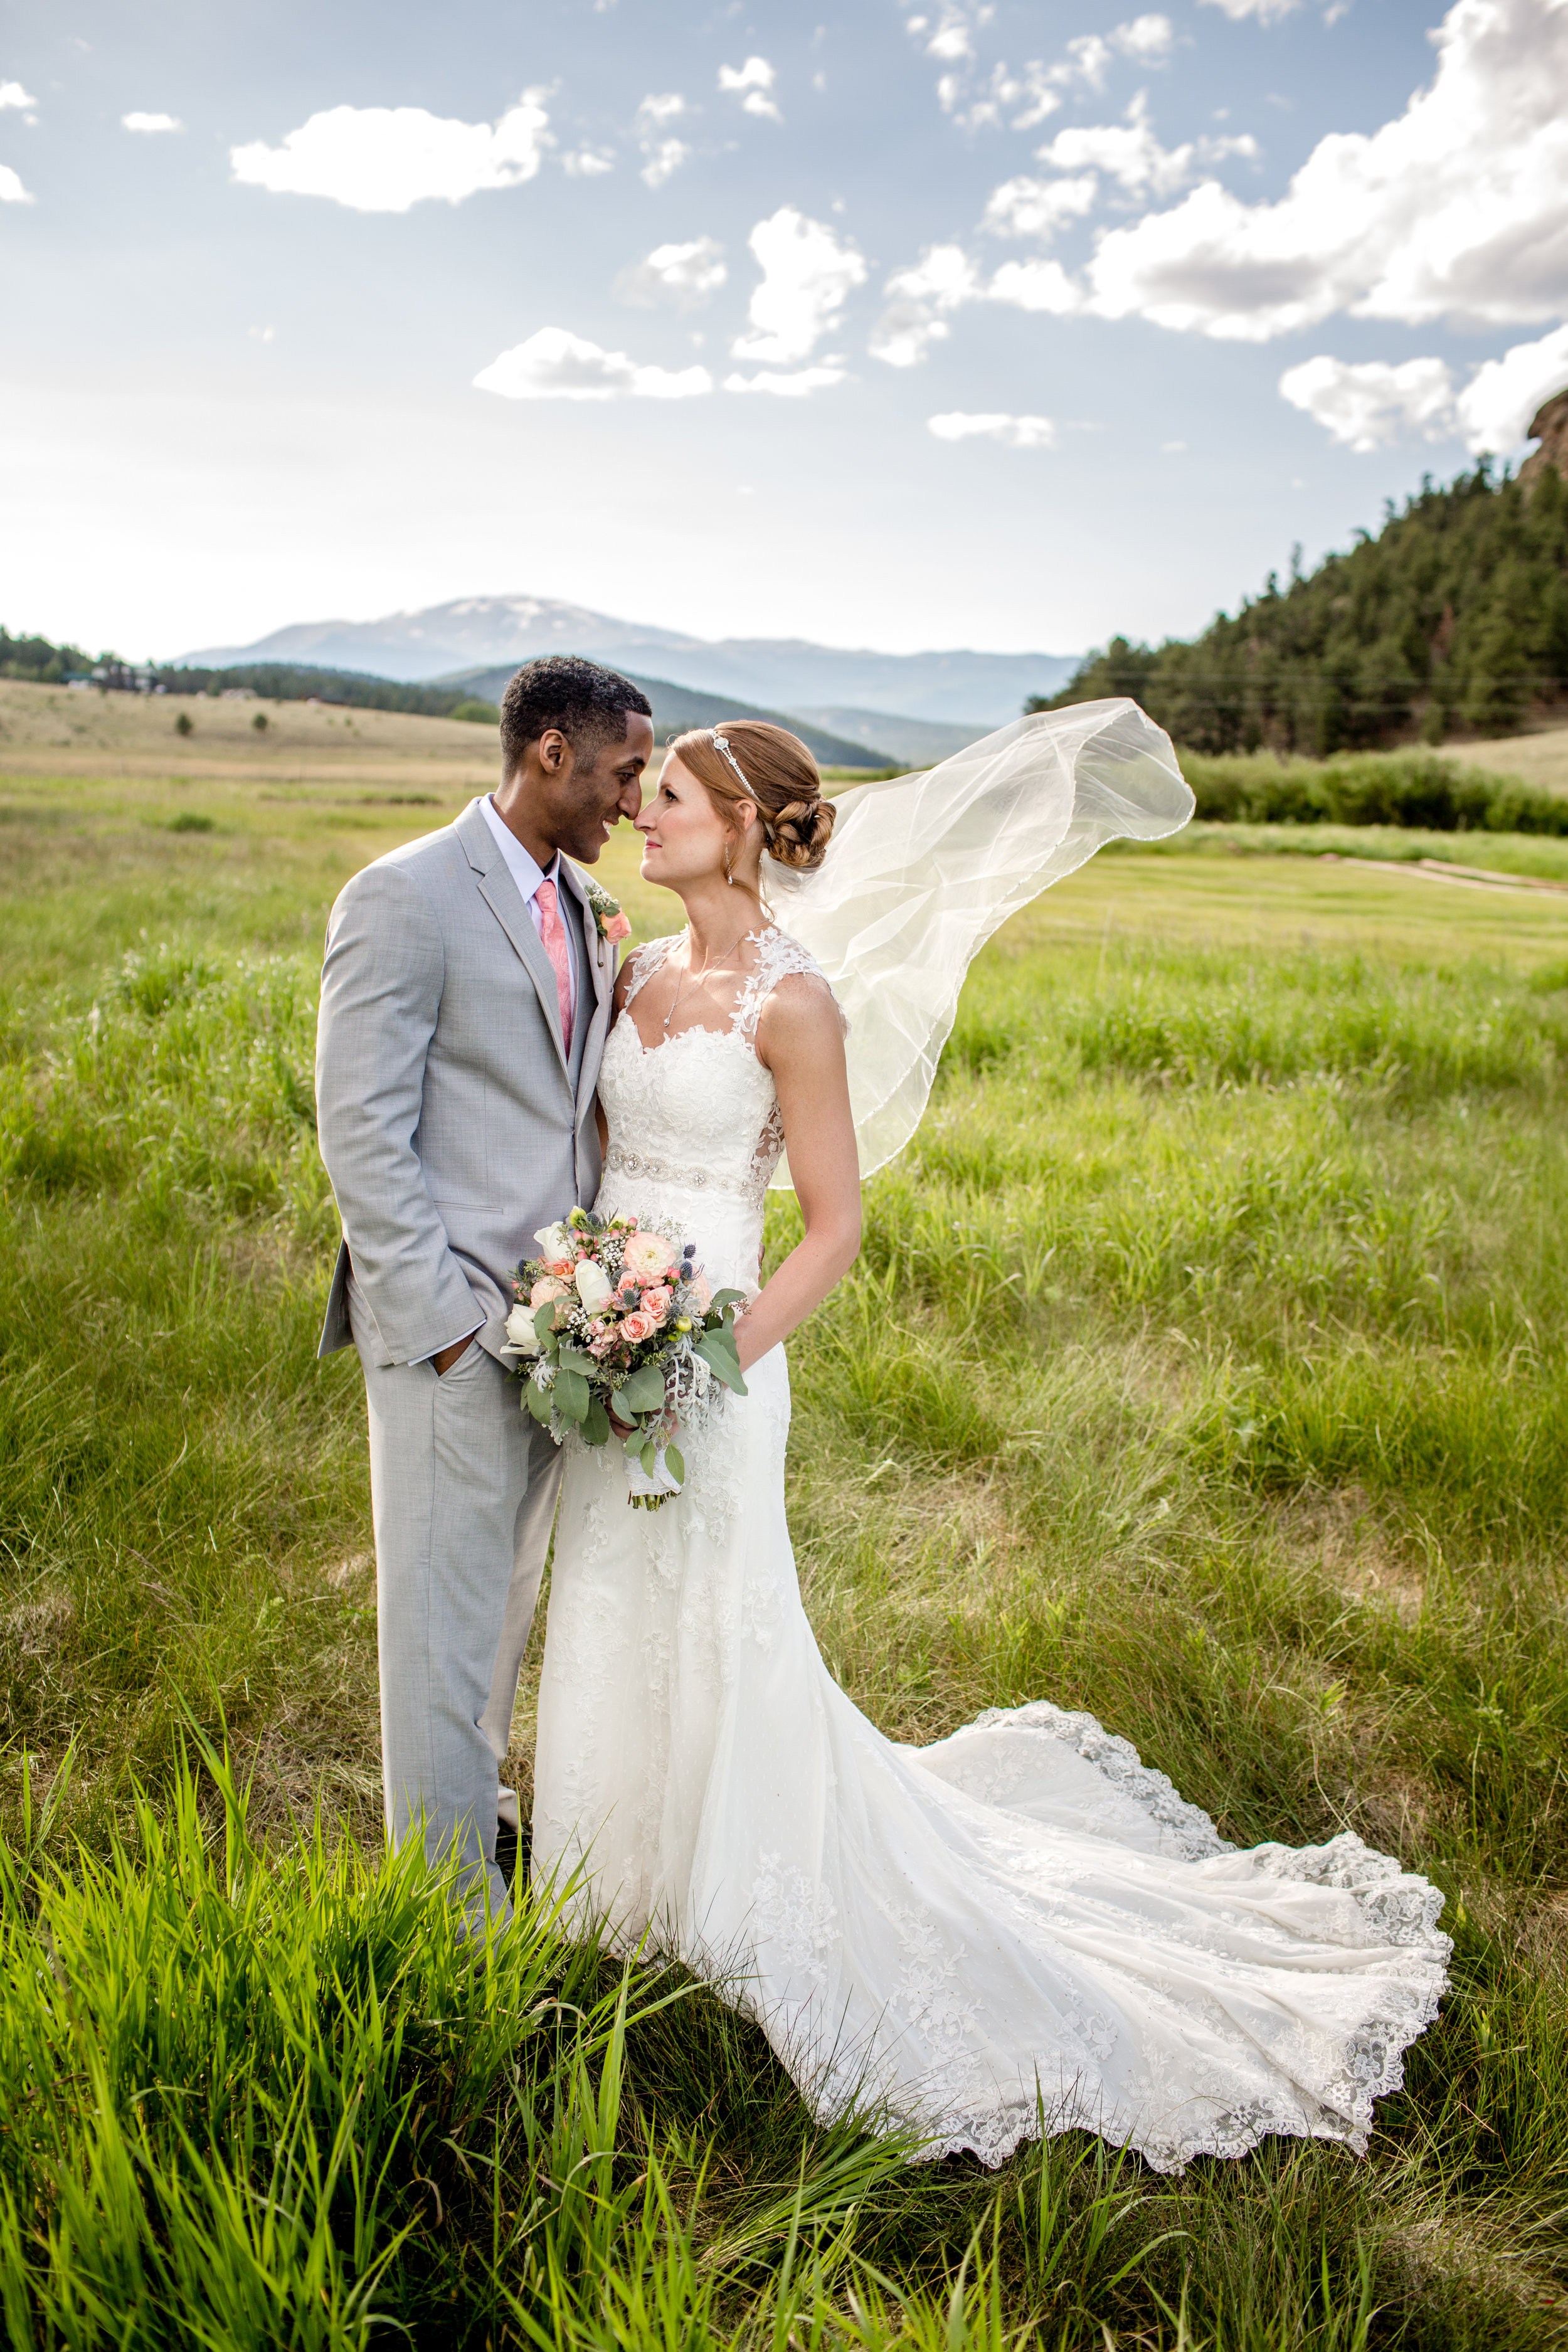 traveling-wedding-hairstylist-updo-specialist-weddings-preslee-hair-style